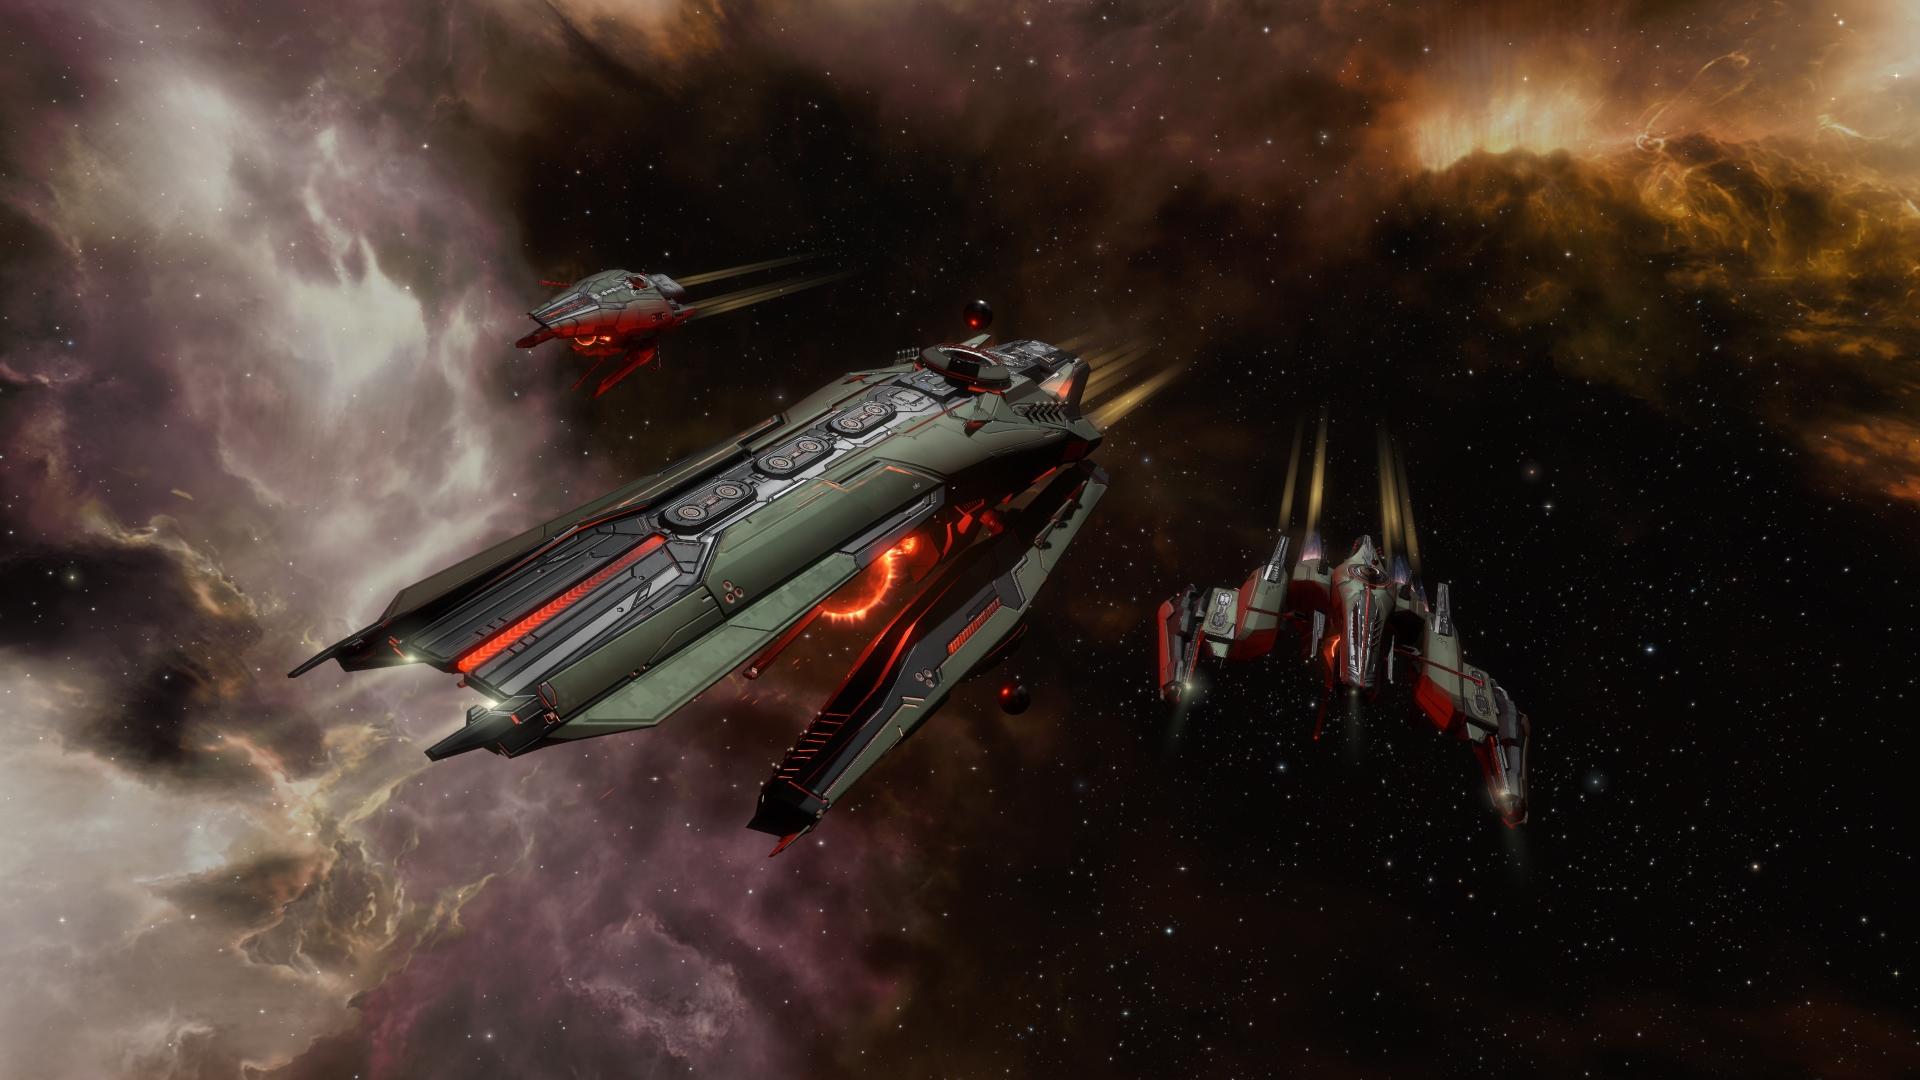 triglavian ships all